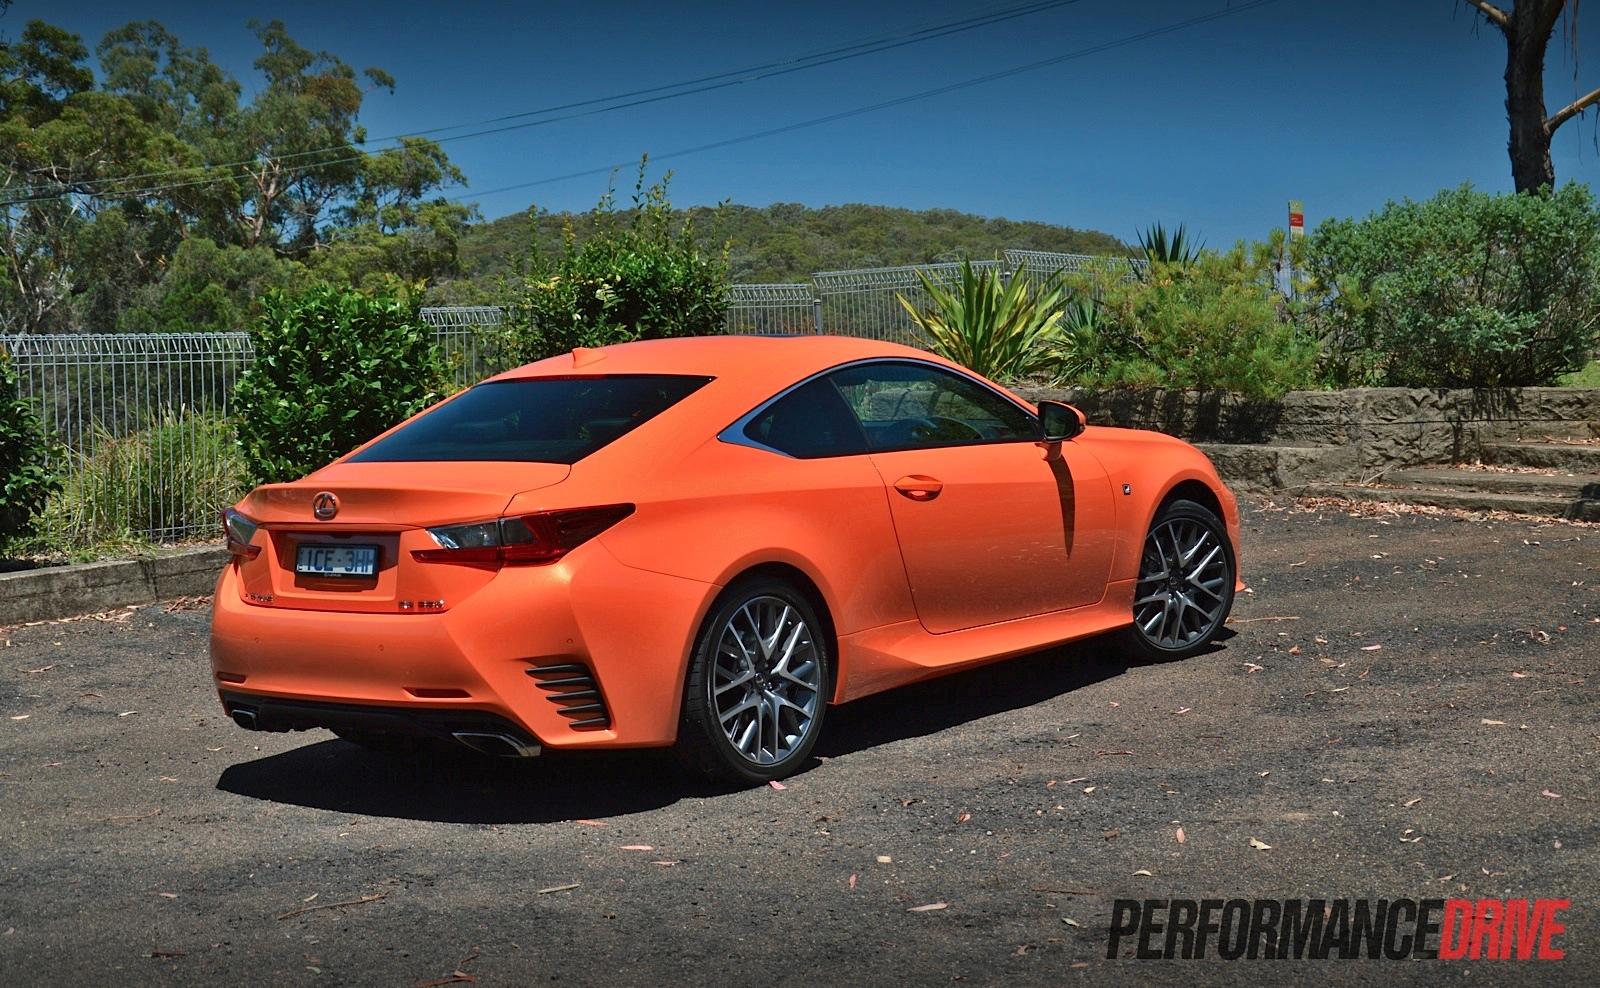 2015 Lexus RC 350 F Sport Review Video PerformanceDrive